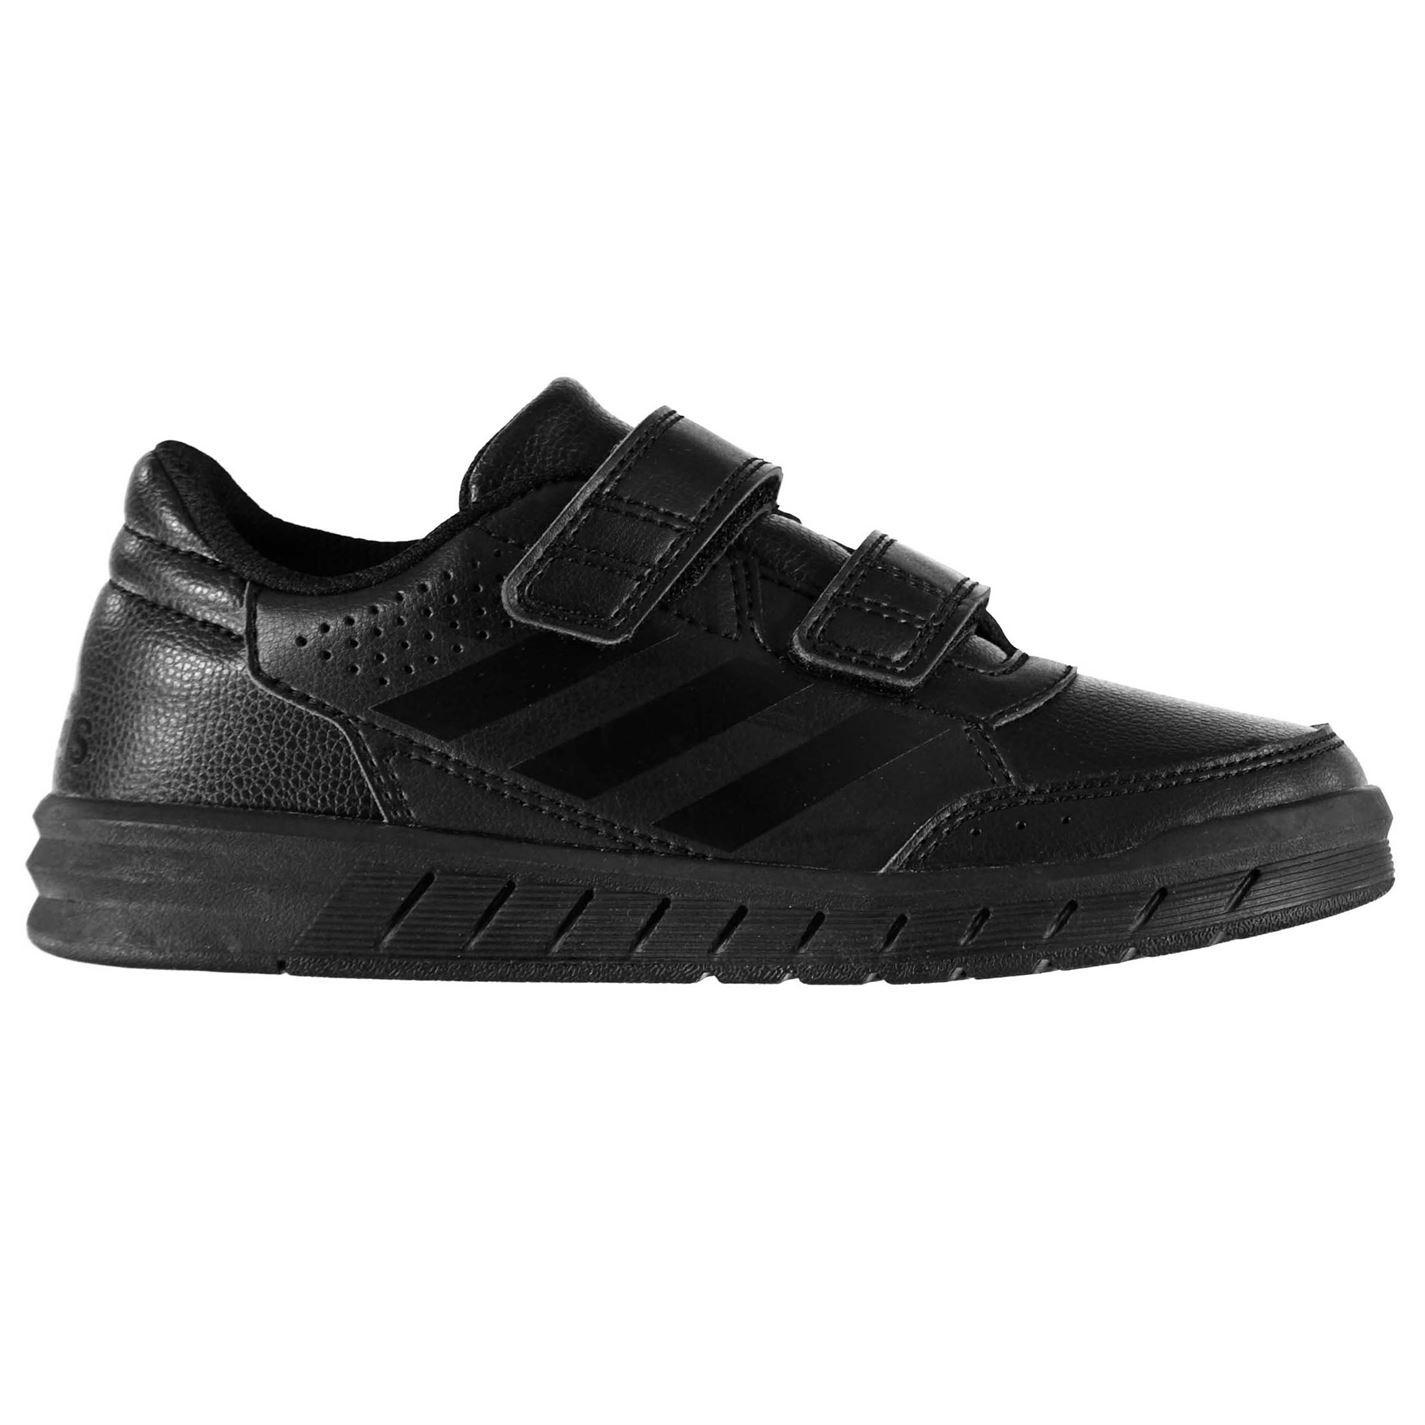 miniatura 5 - ADIDAS-alta-Sport-CF-Scarpe-da-ginnastica-bambino-ragazzo-calzature